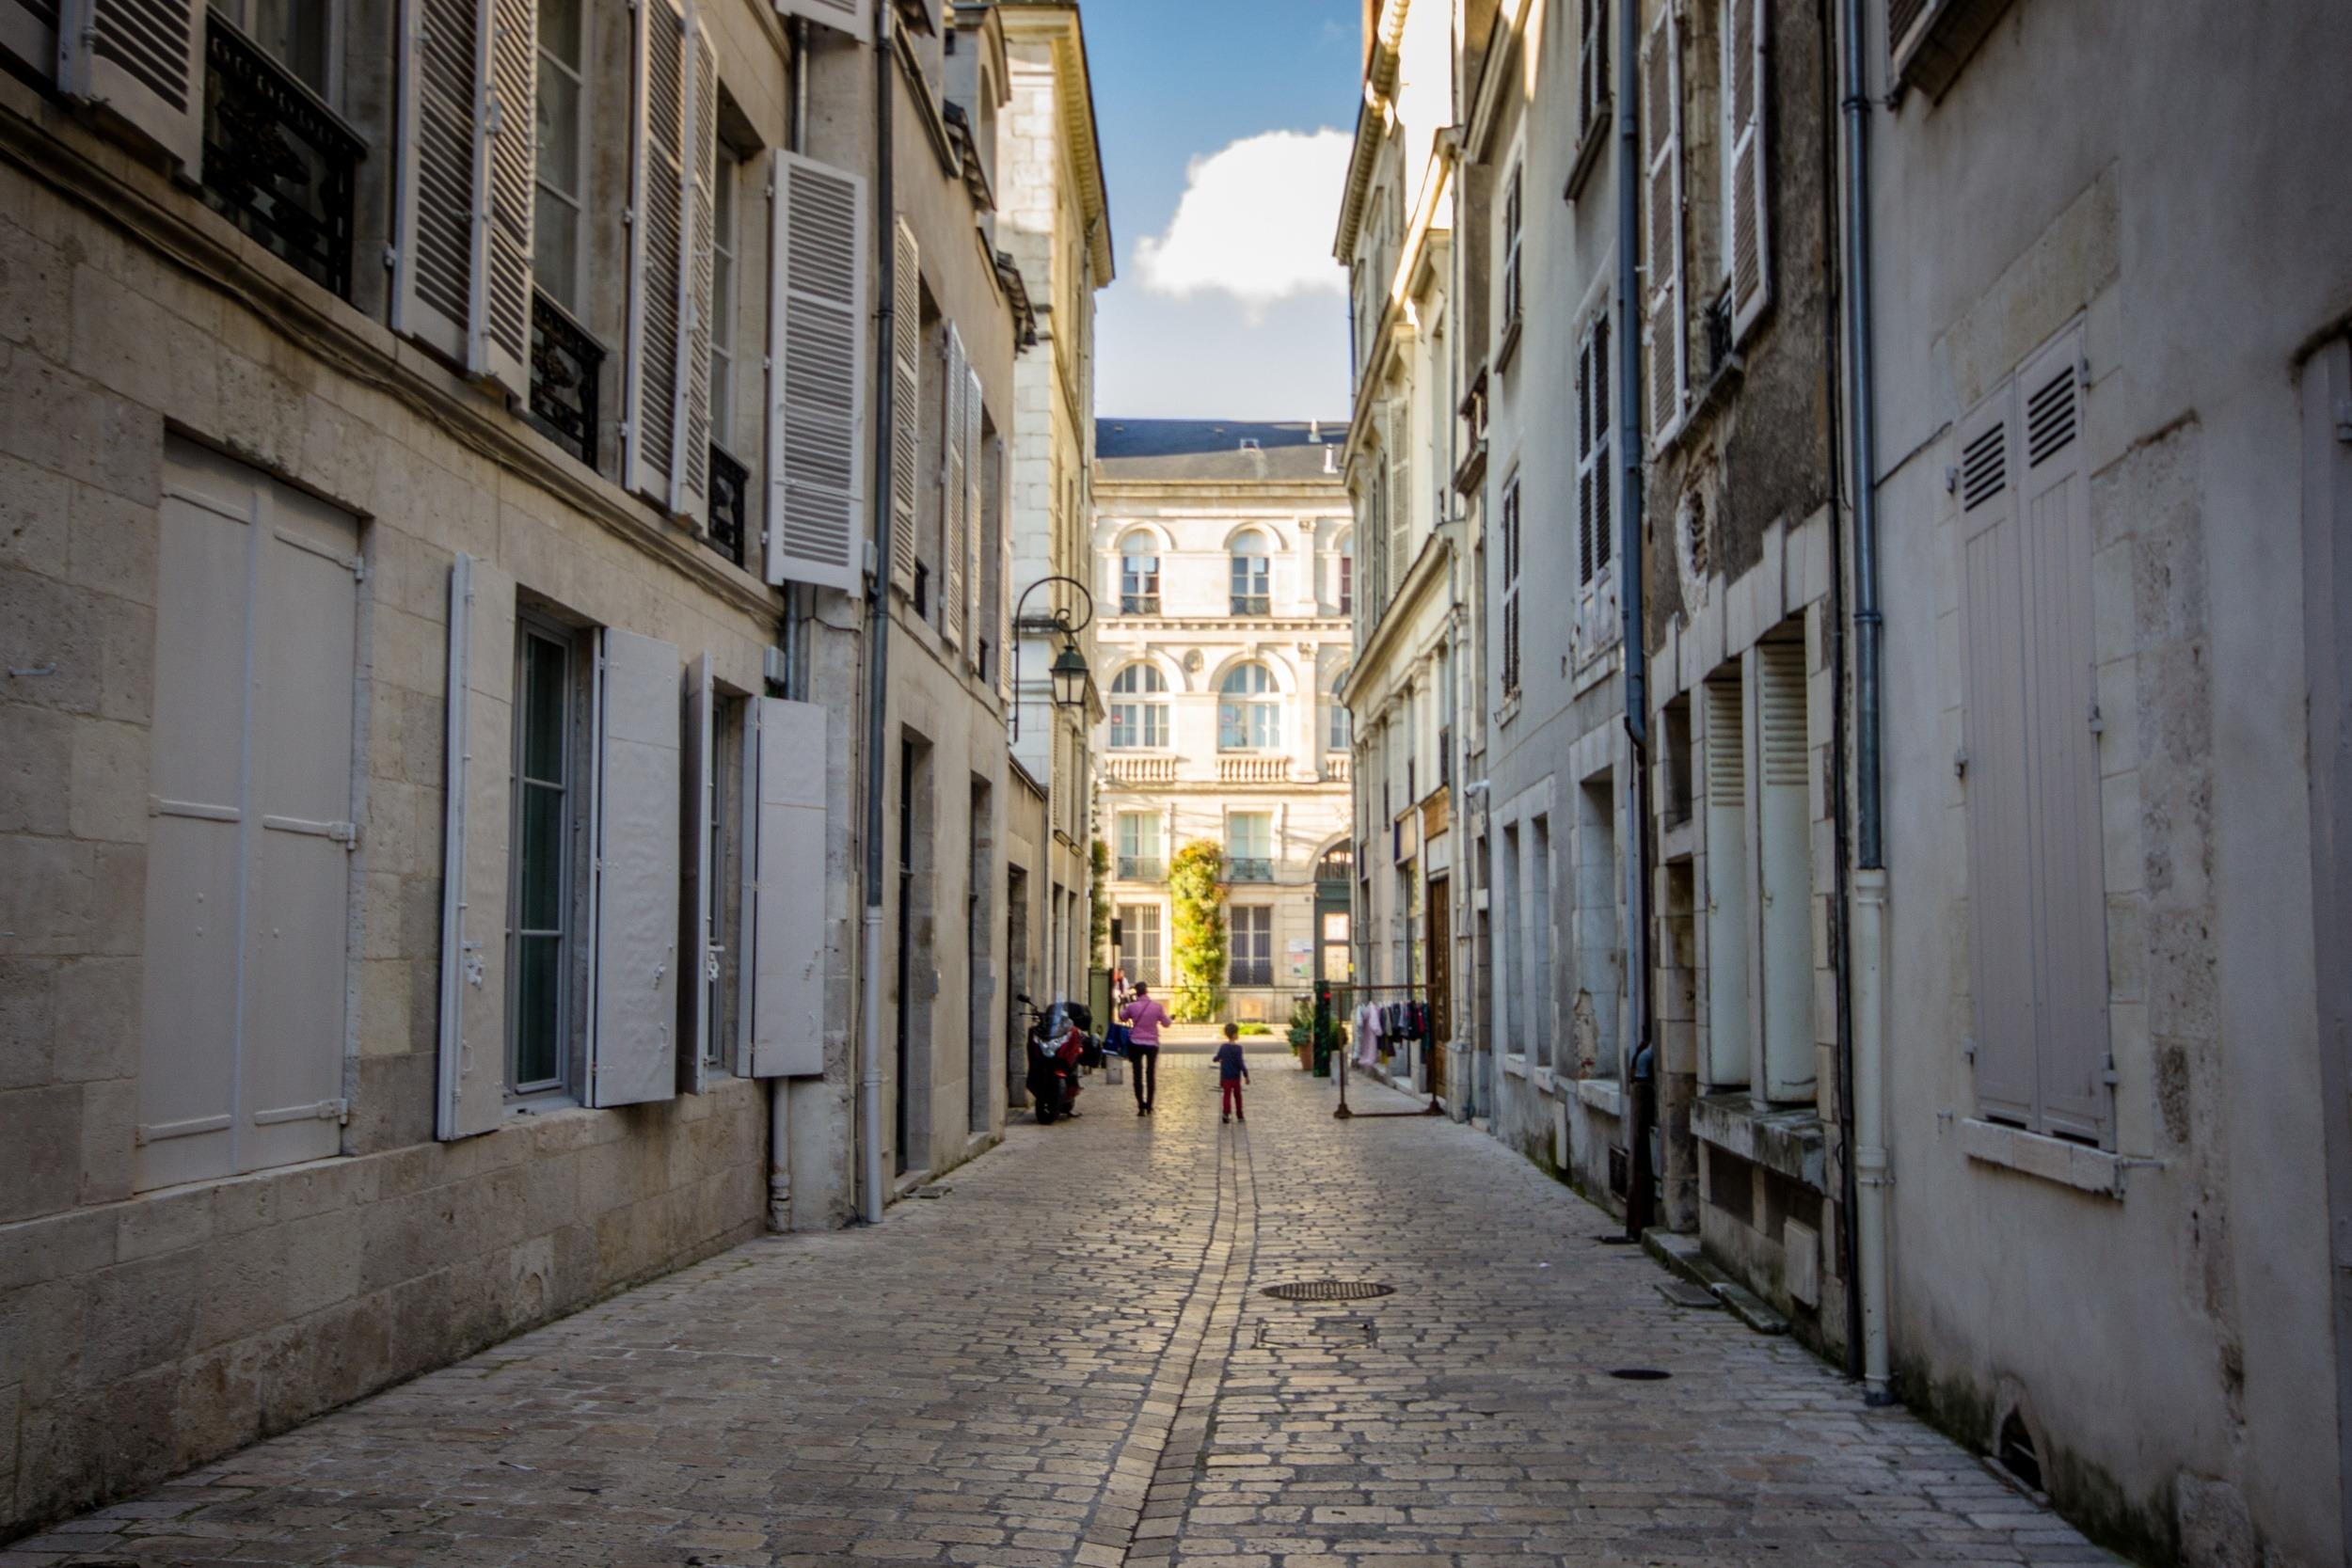 Orleans, France